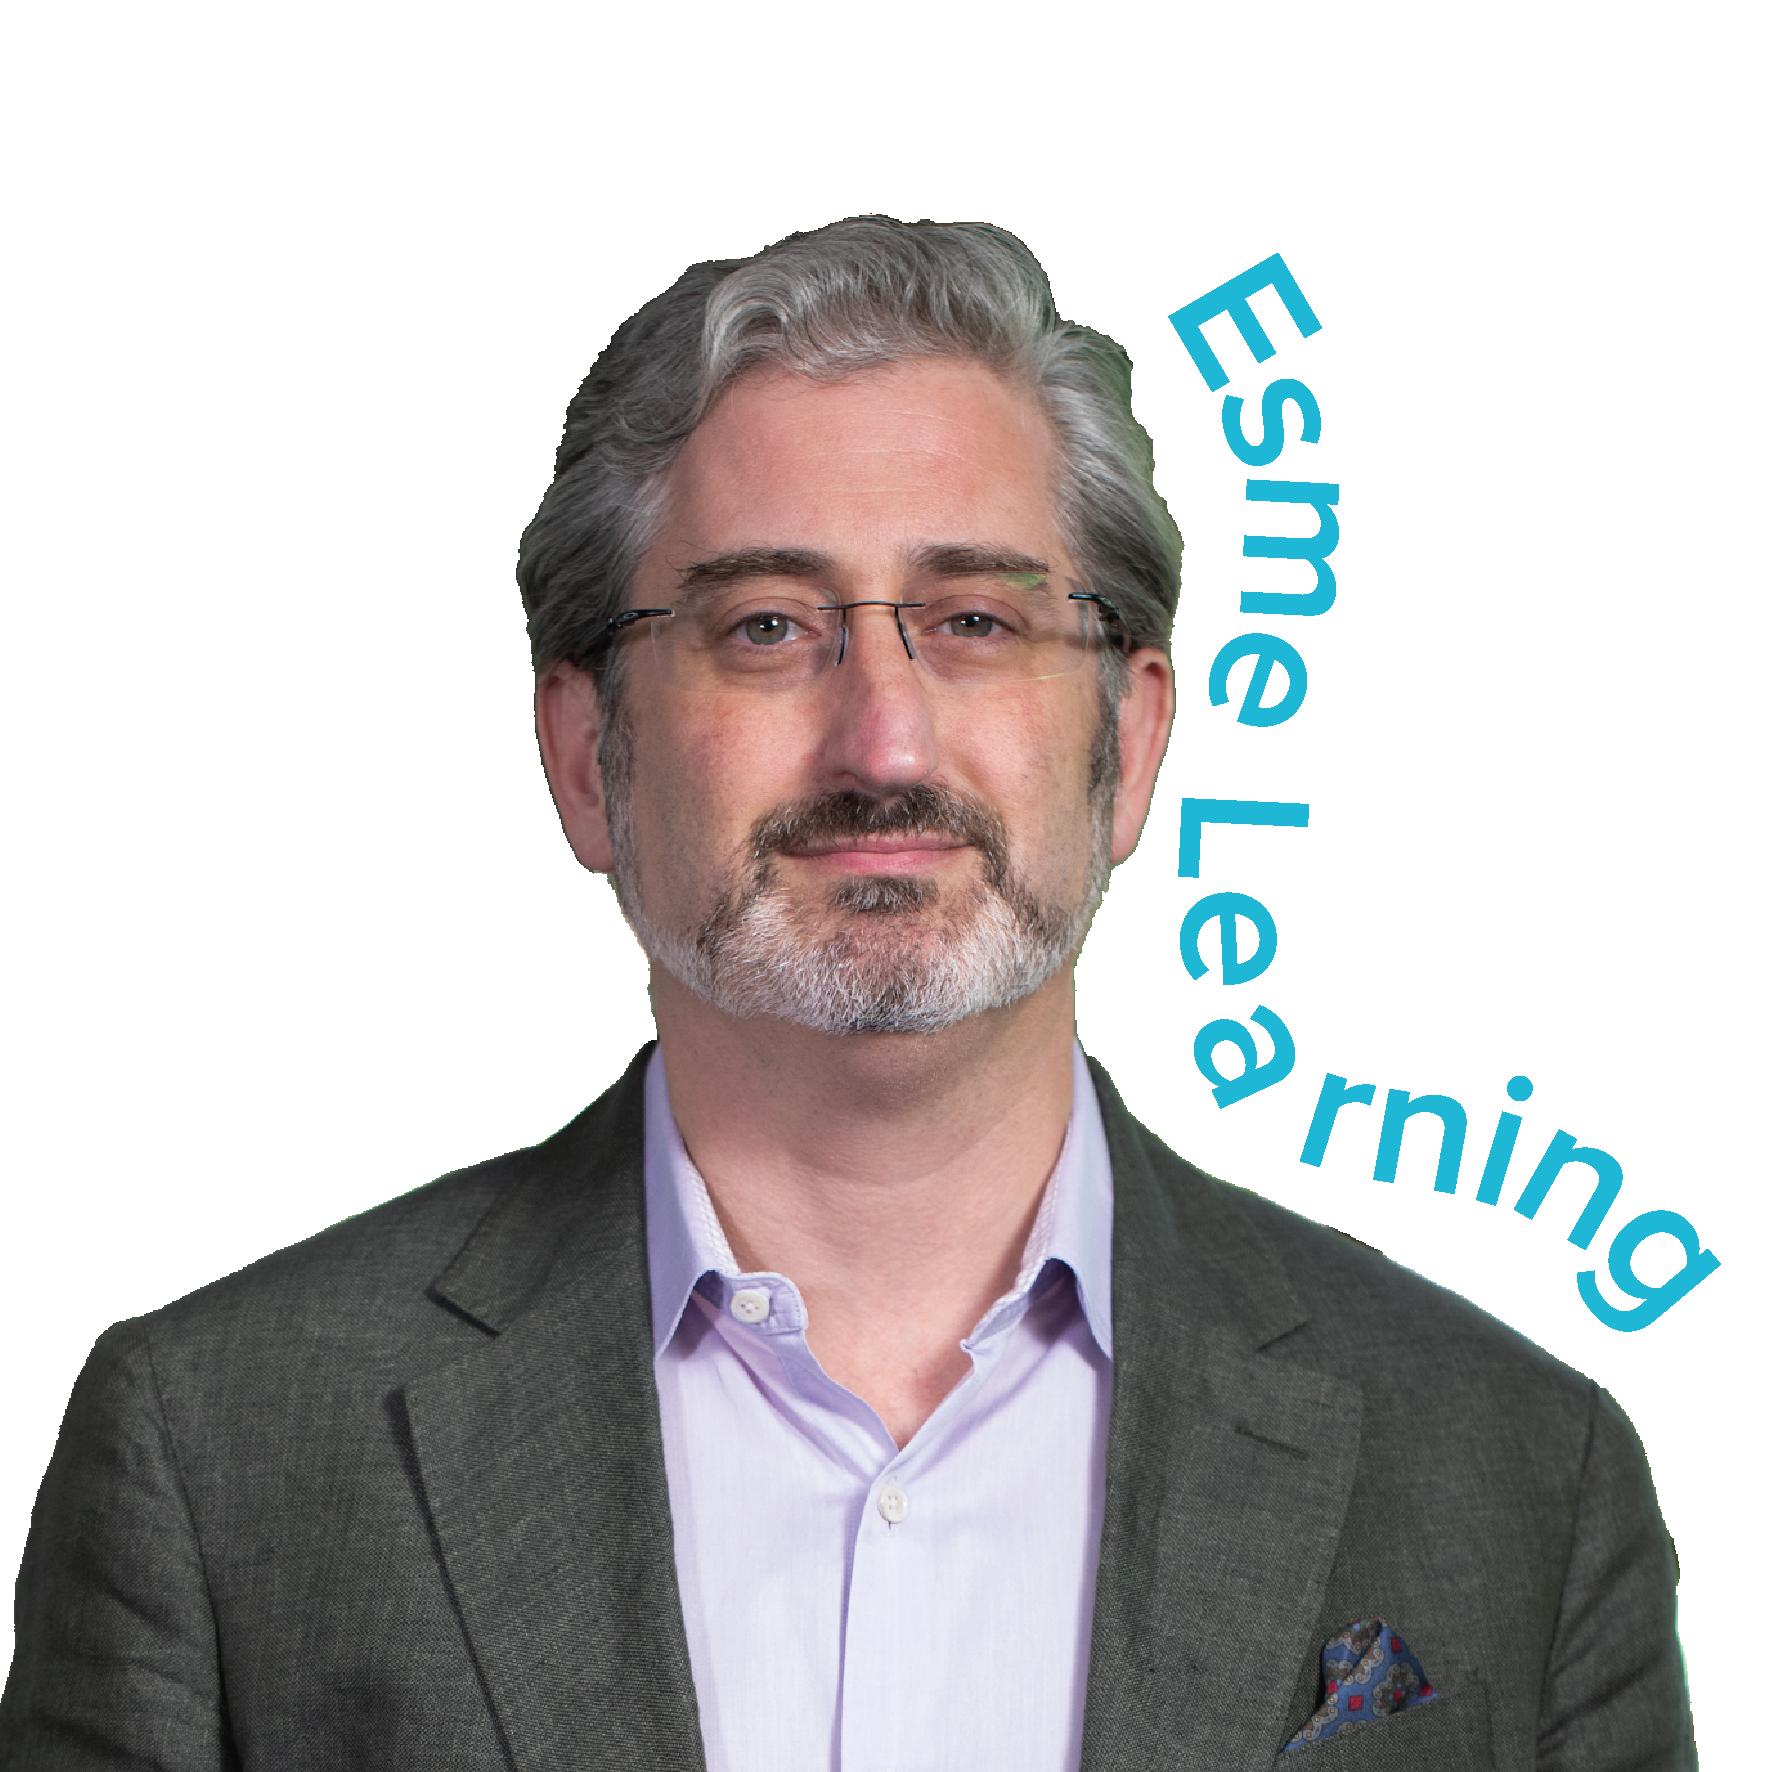 David Shrier, CEO, Esme Learning